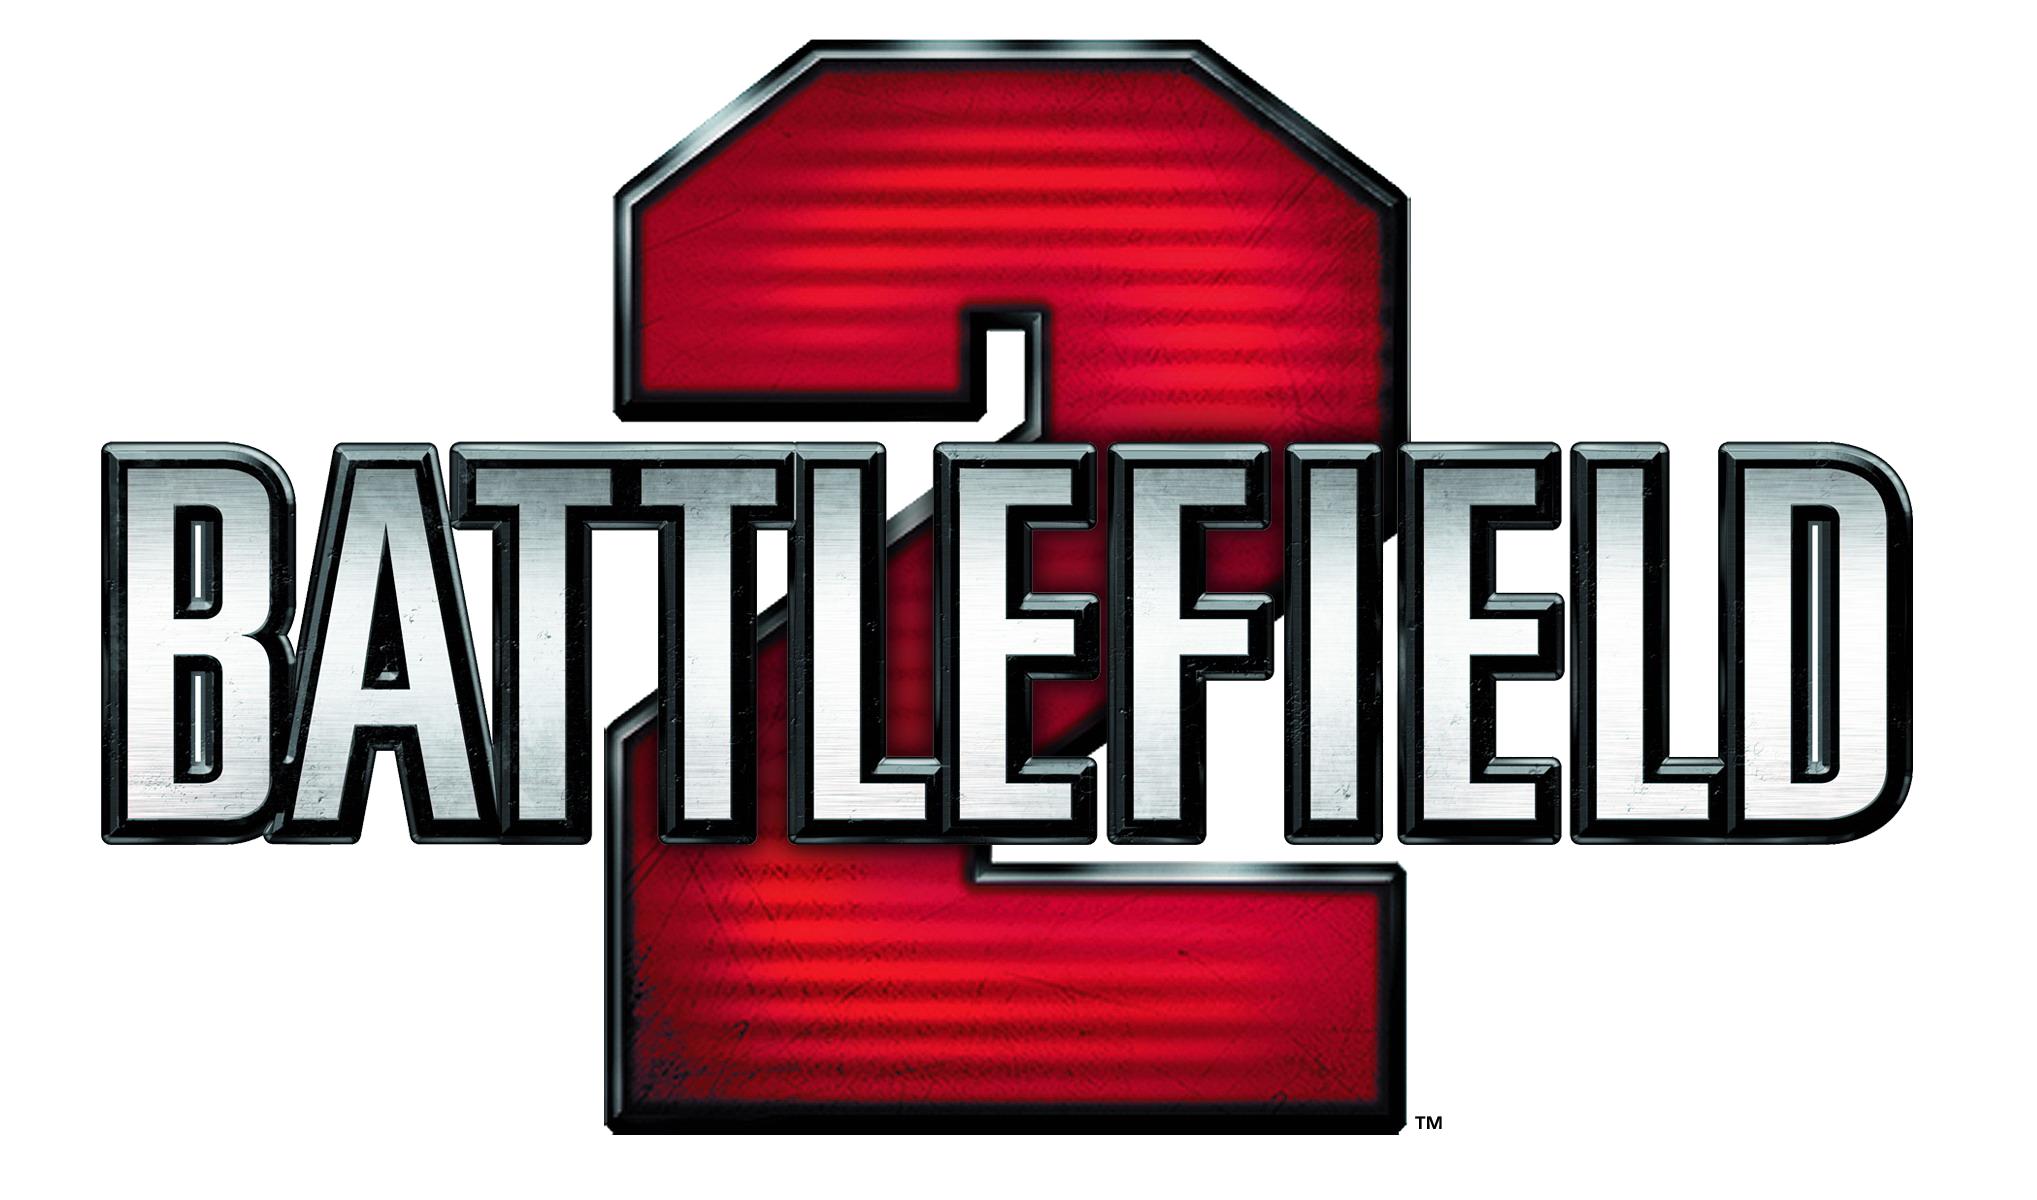 Battlefield 2 логотип PNG